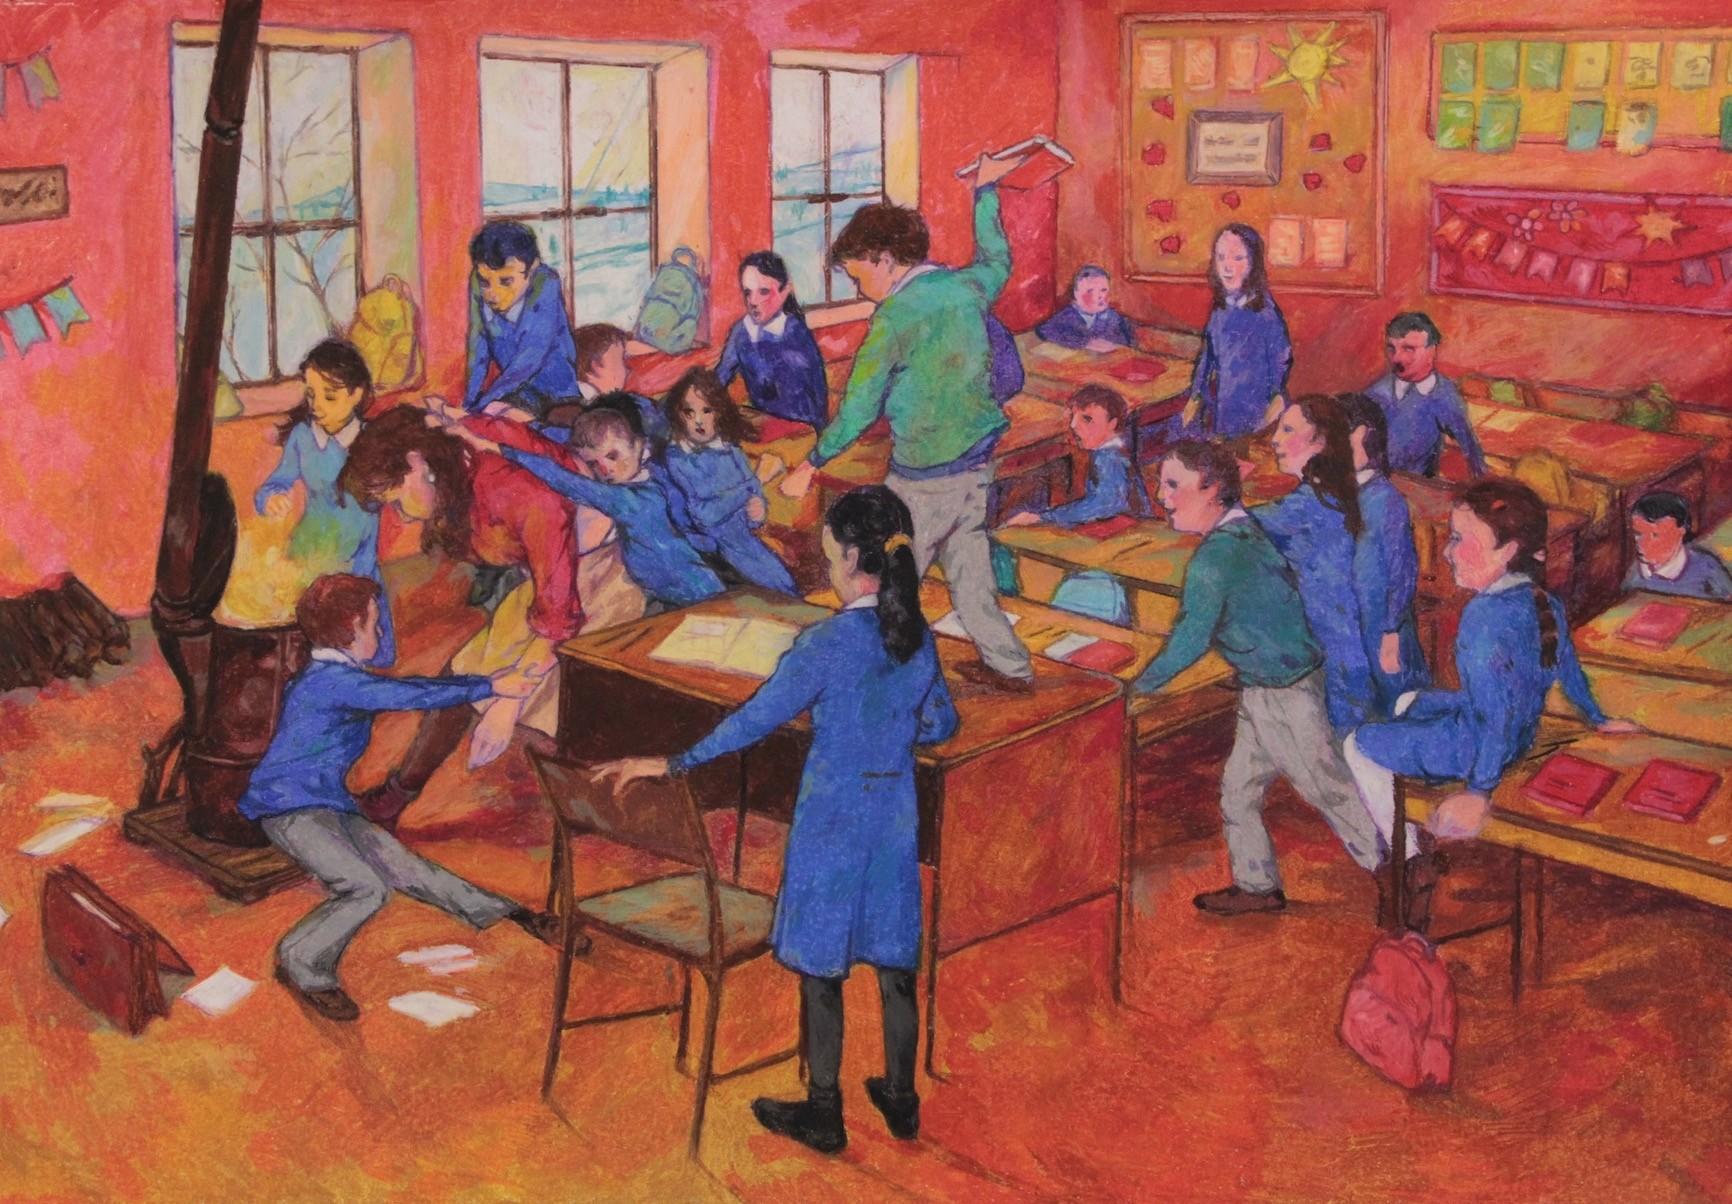 Gu00f6khun Baltacu0131, u201cUnnamed,u201d 2017 Crayon on paper, 70x100cm.